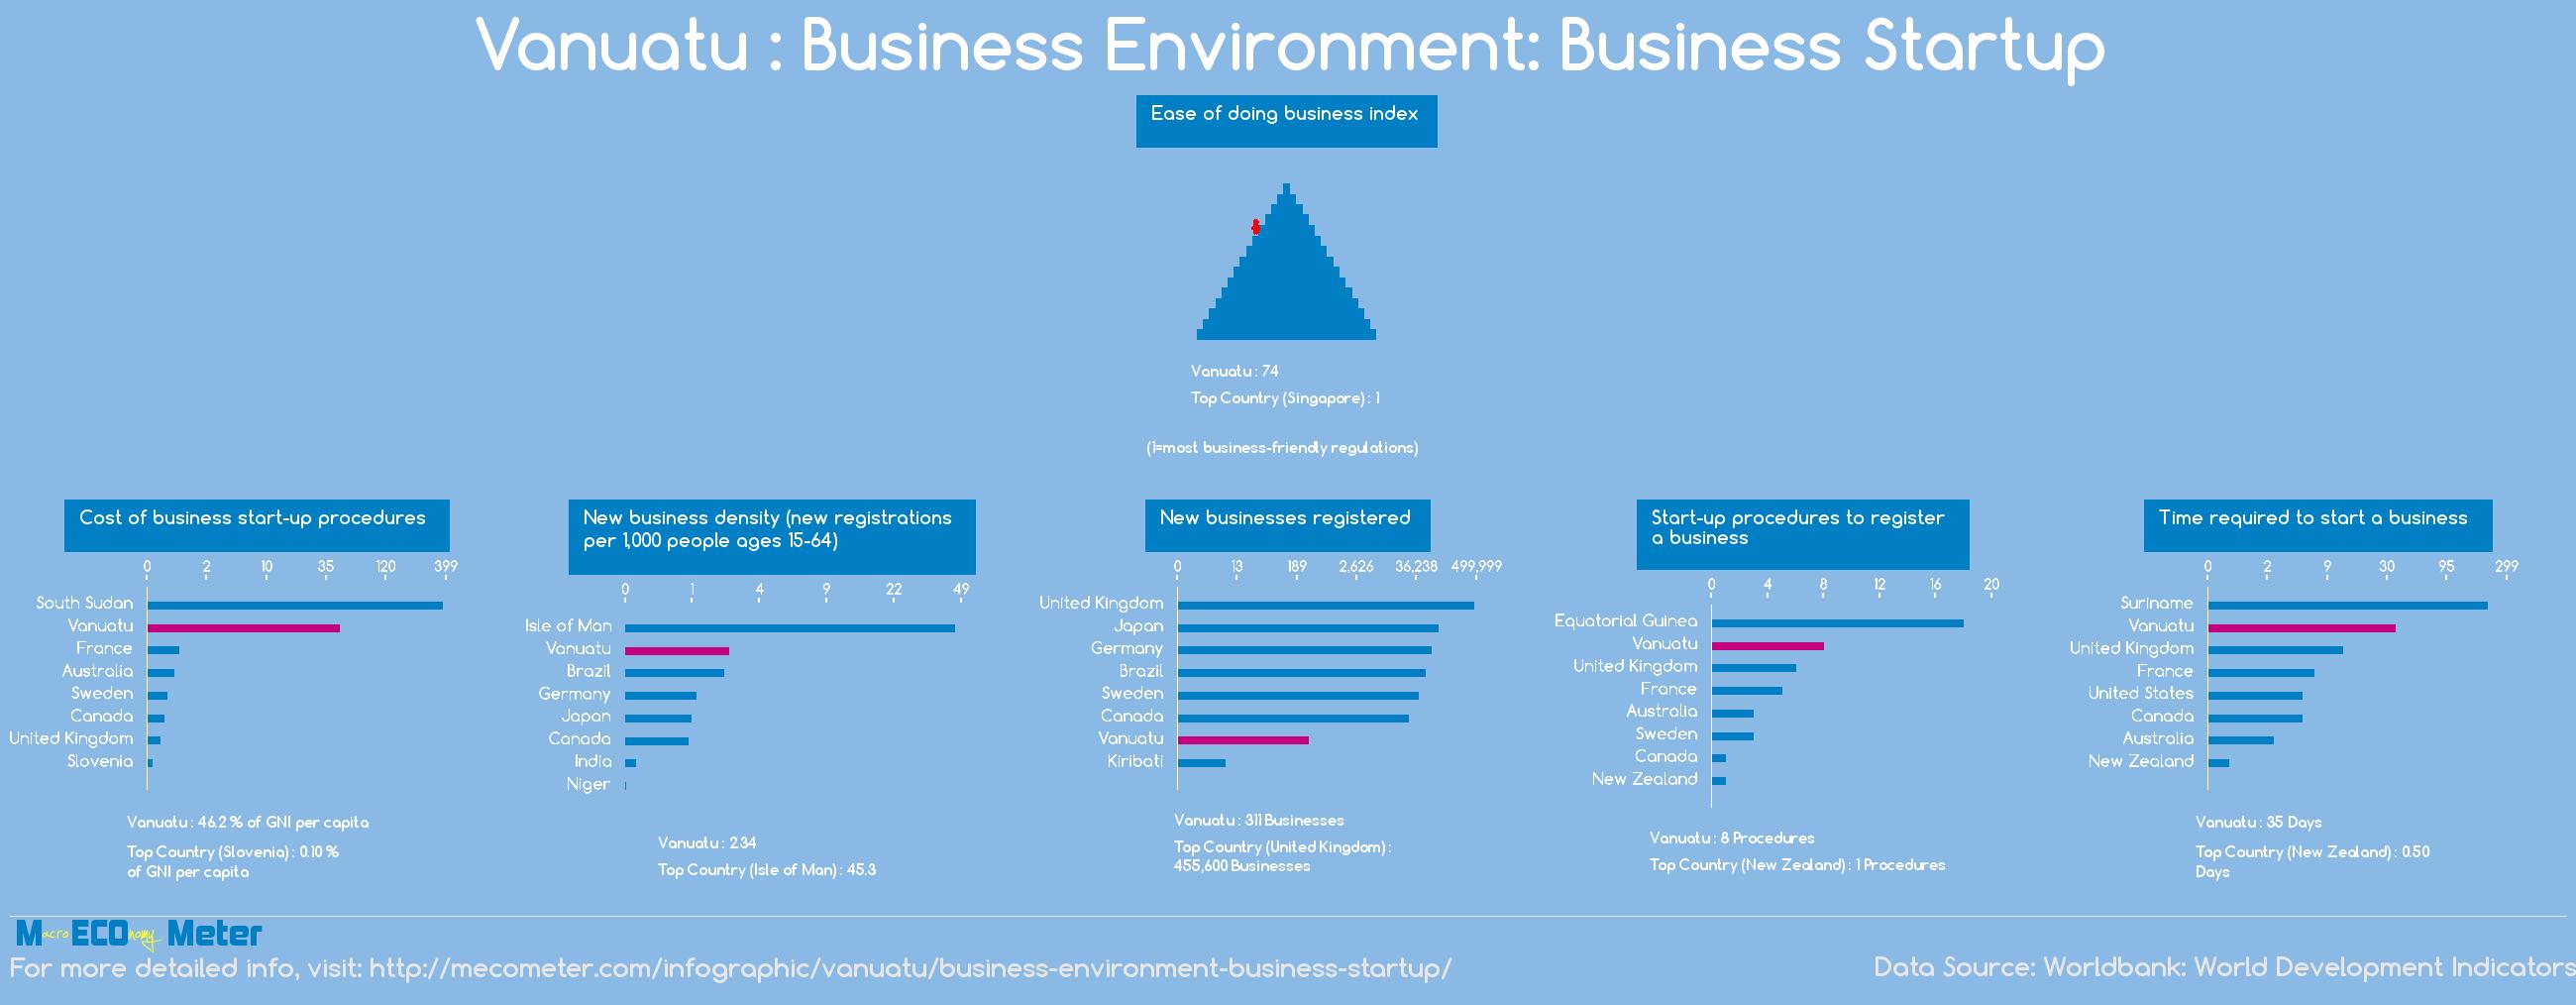 Vanuatu : Business Environment: Business Startup